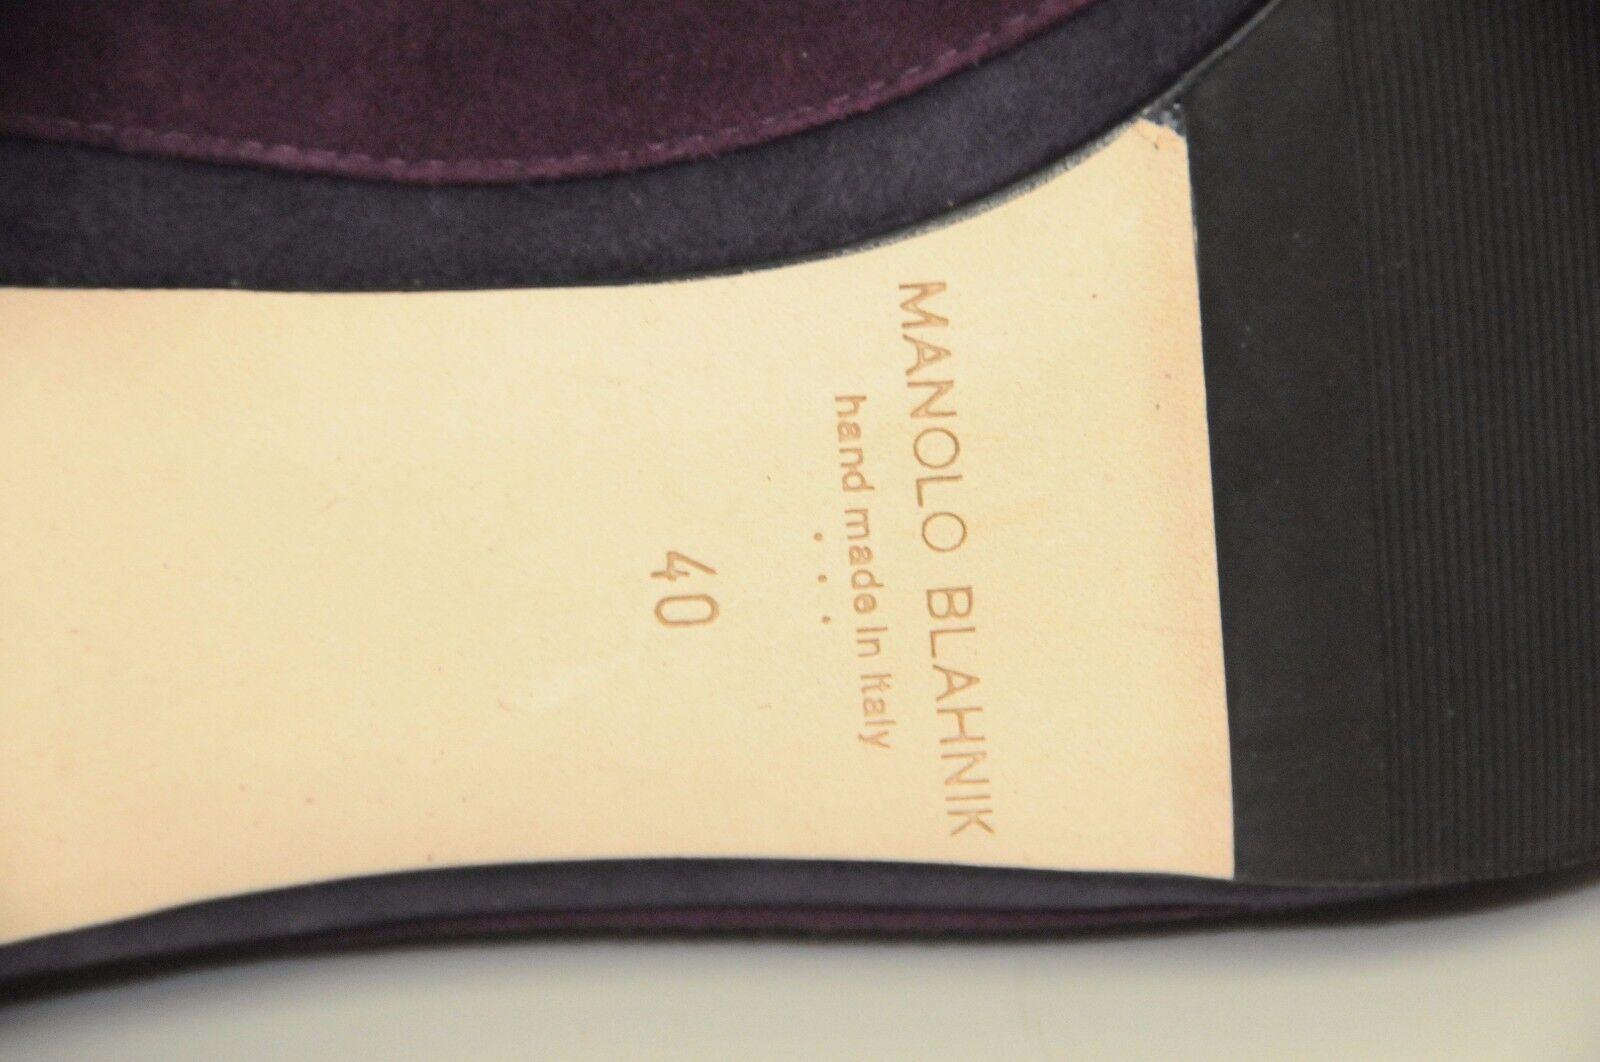 825 825 825 NEW Manolo Blahnik SFIDA BB 50 Newcio violetc violet chaussures Kitten Heels 40 1a4123